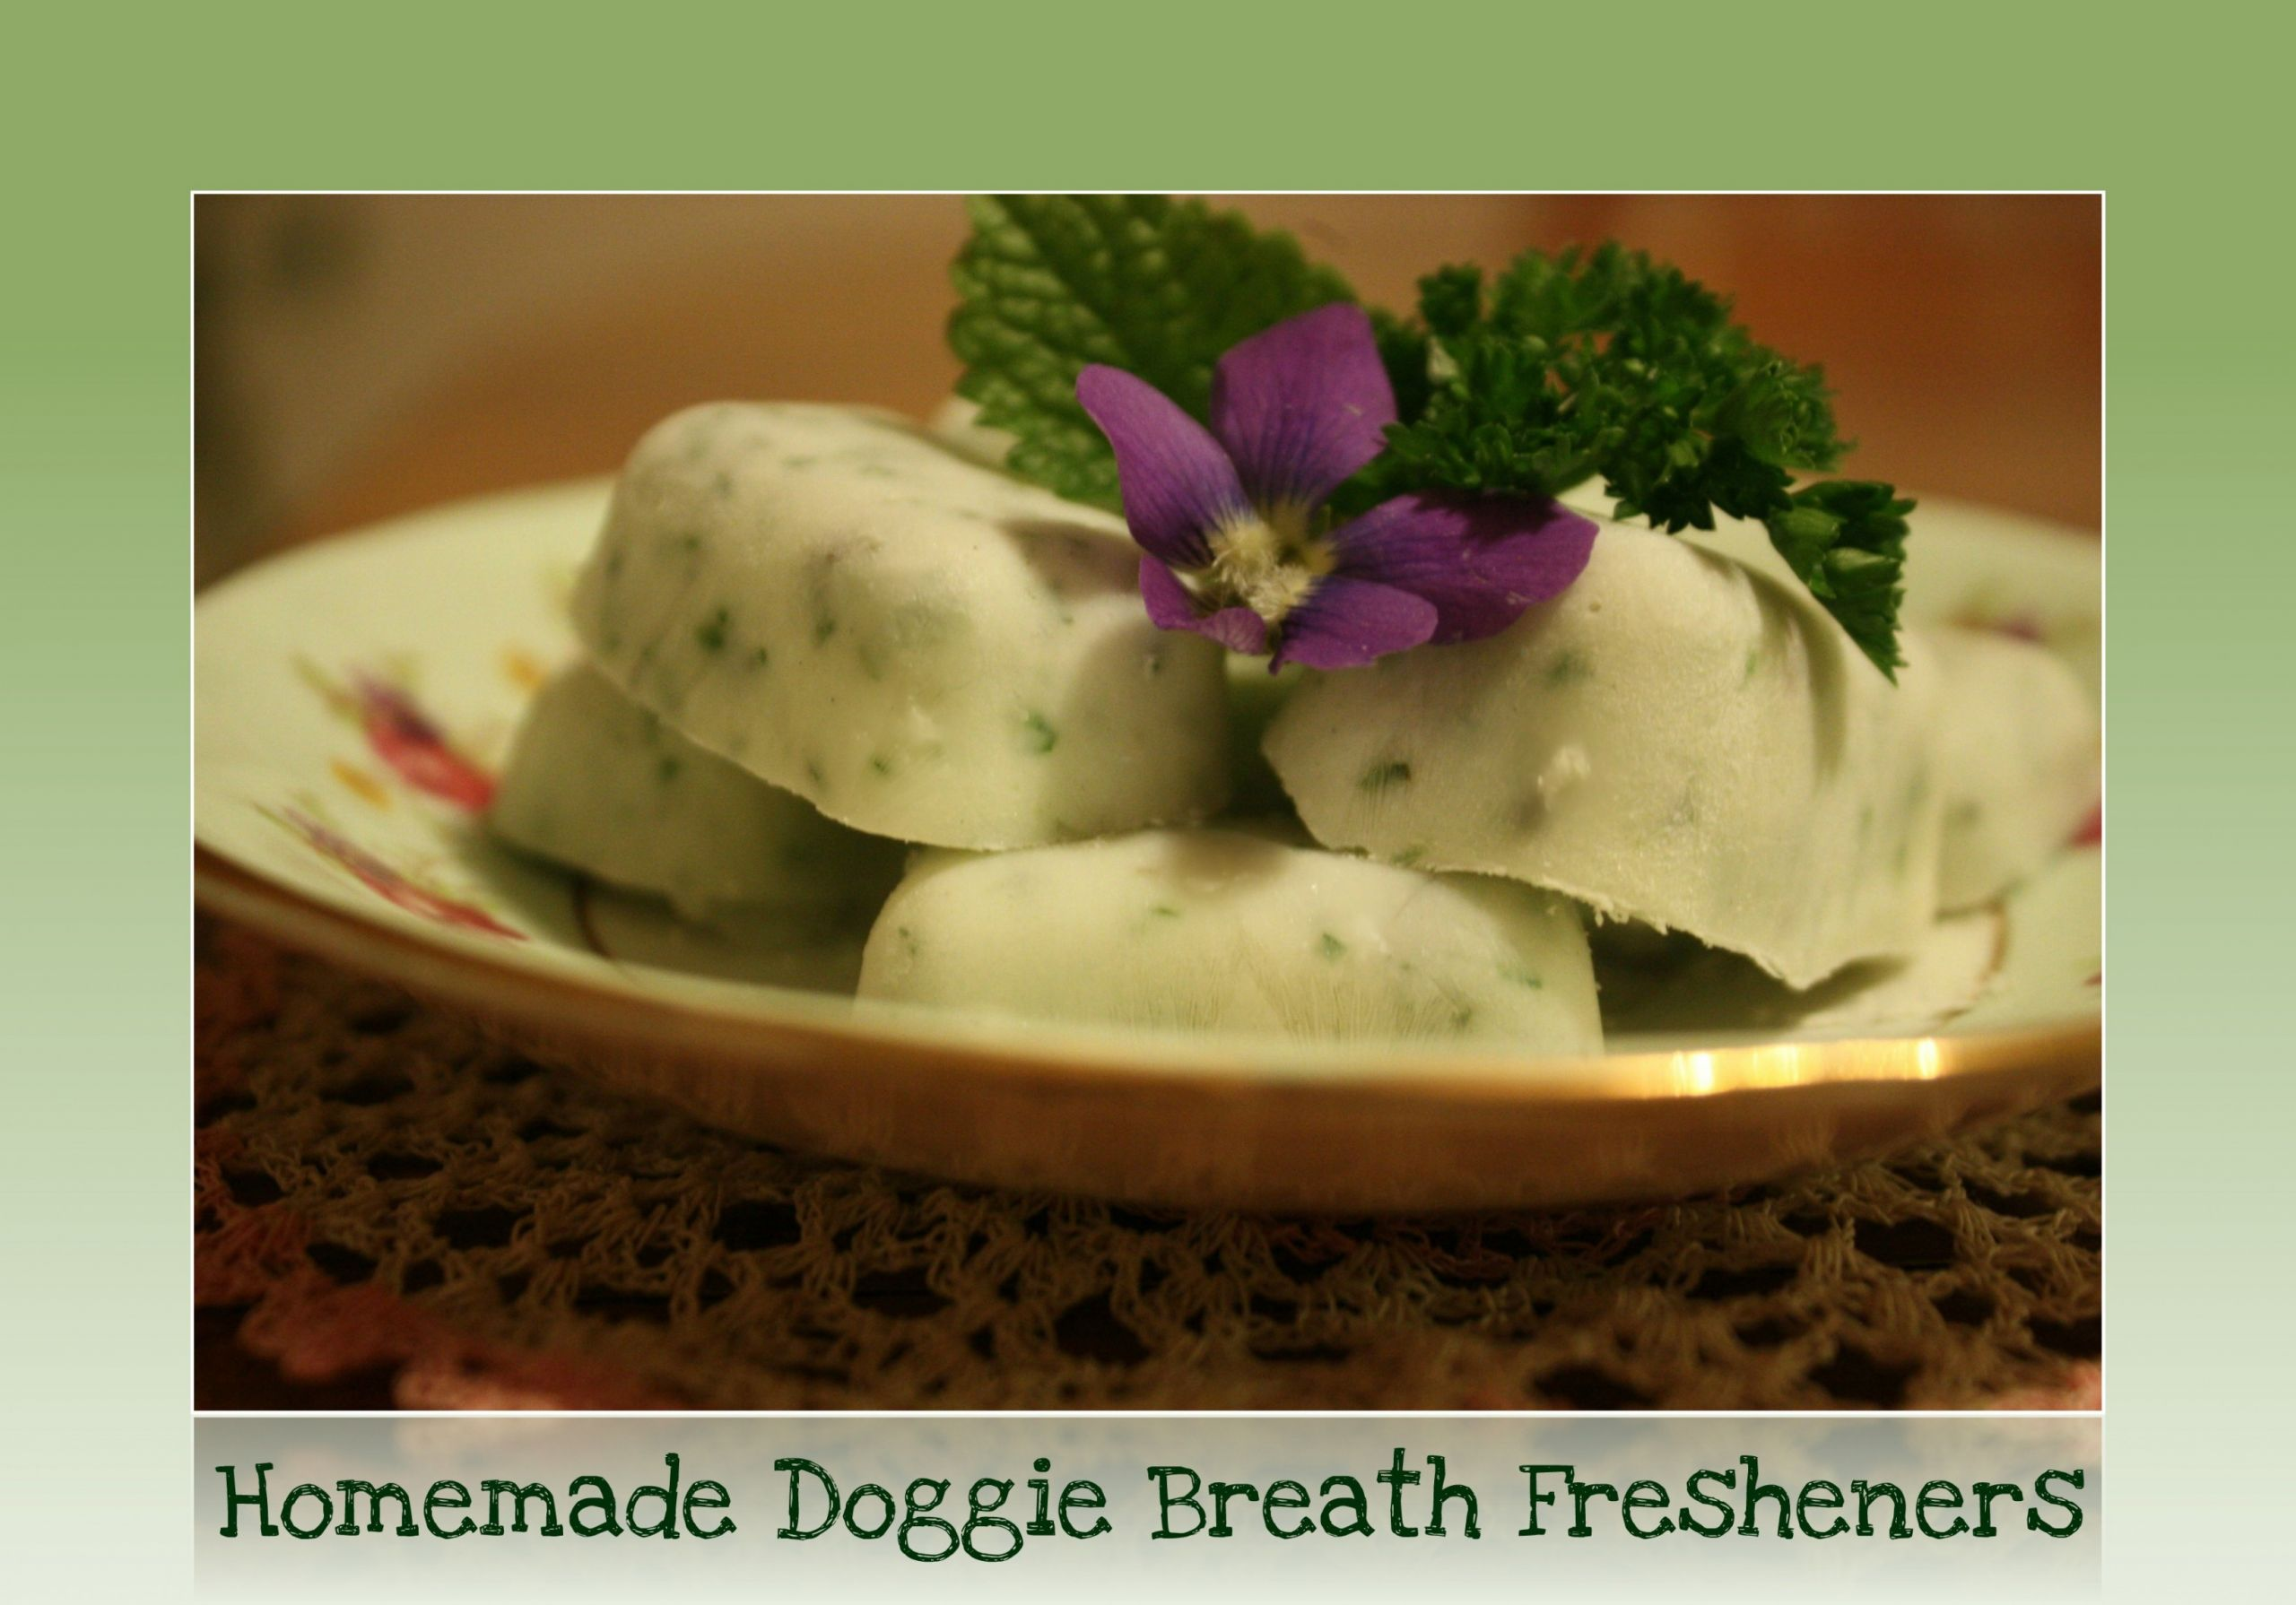 DIY Dog Breath Freshener  Homemade Doggie Breath Freshener Treats